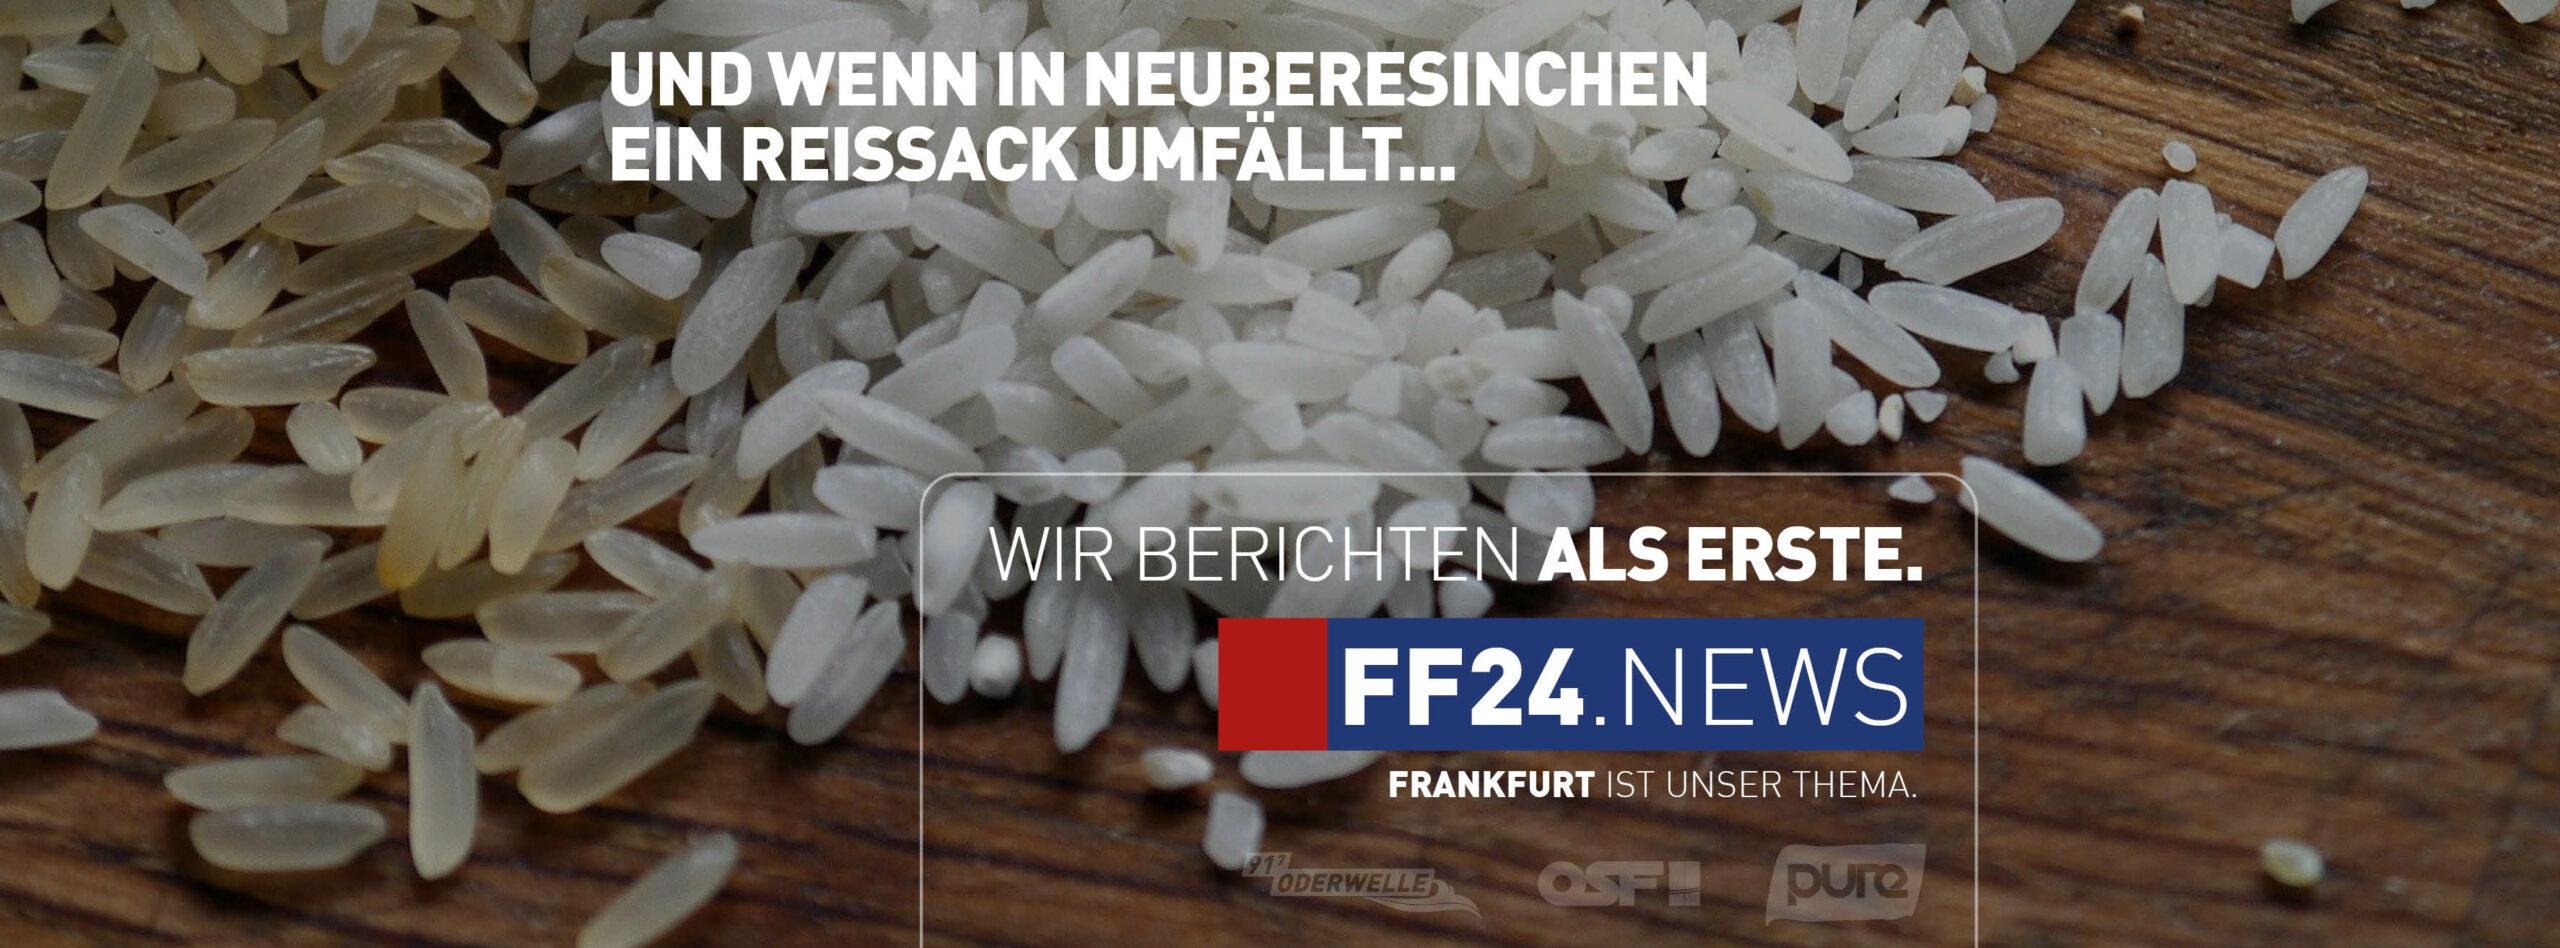 http://www.ff24.news/wp-content/uploads/21-03-27-ff24-fb-kampagne-reis-scaled.jpg